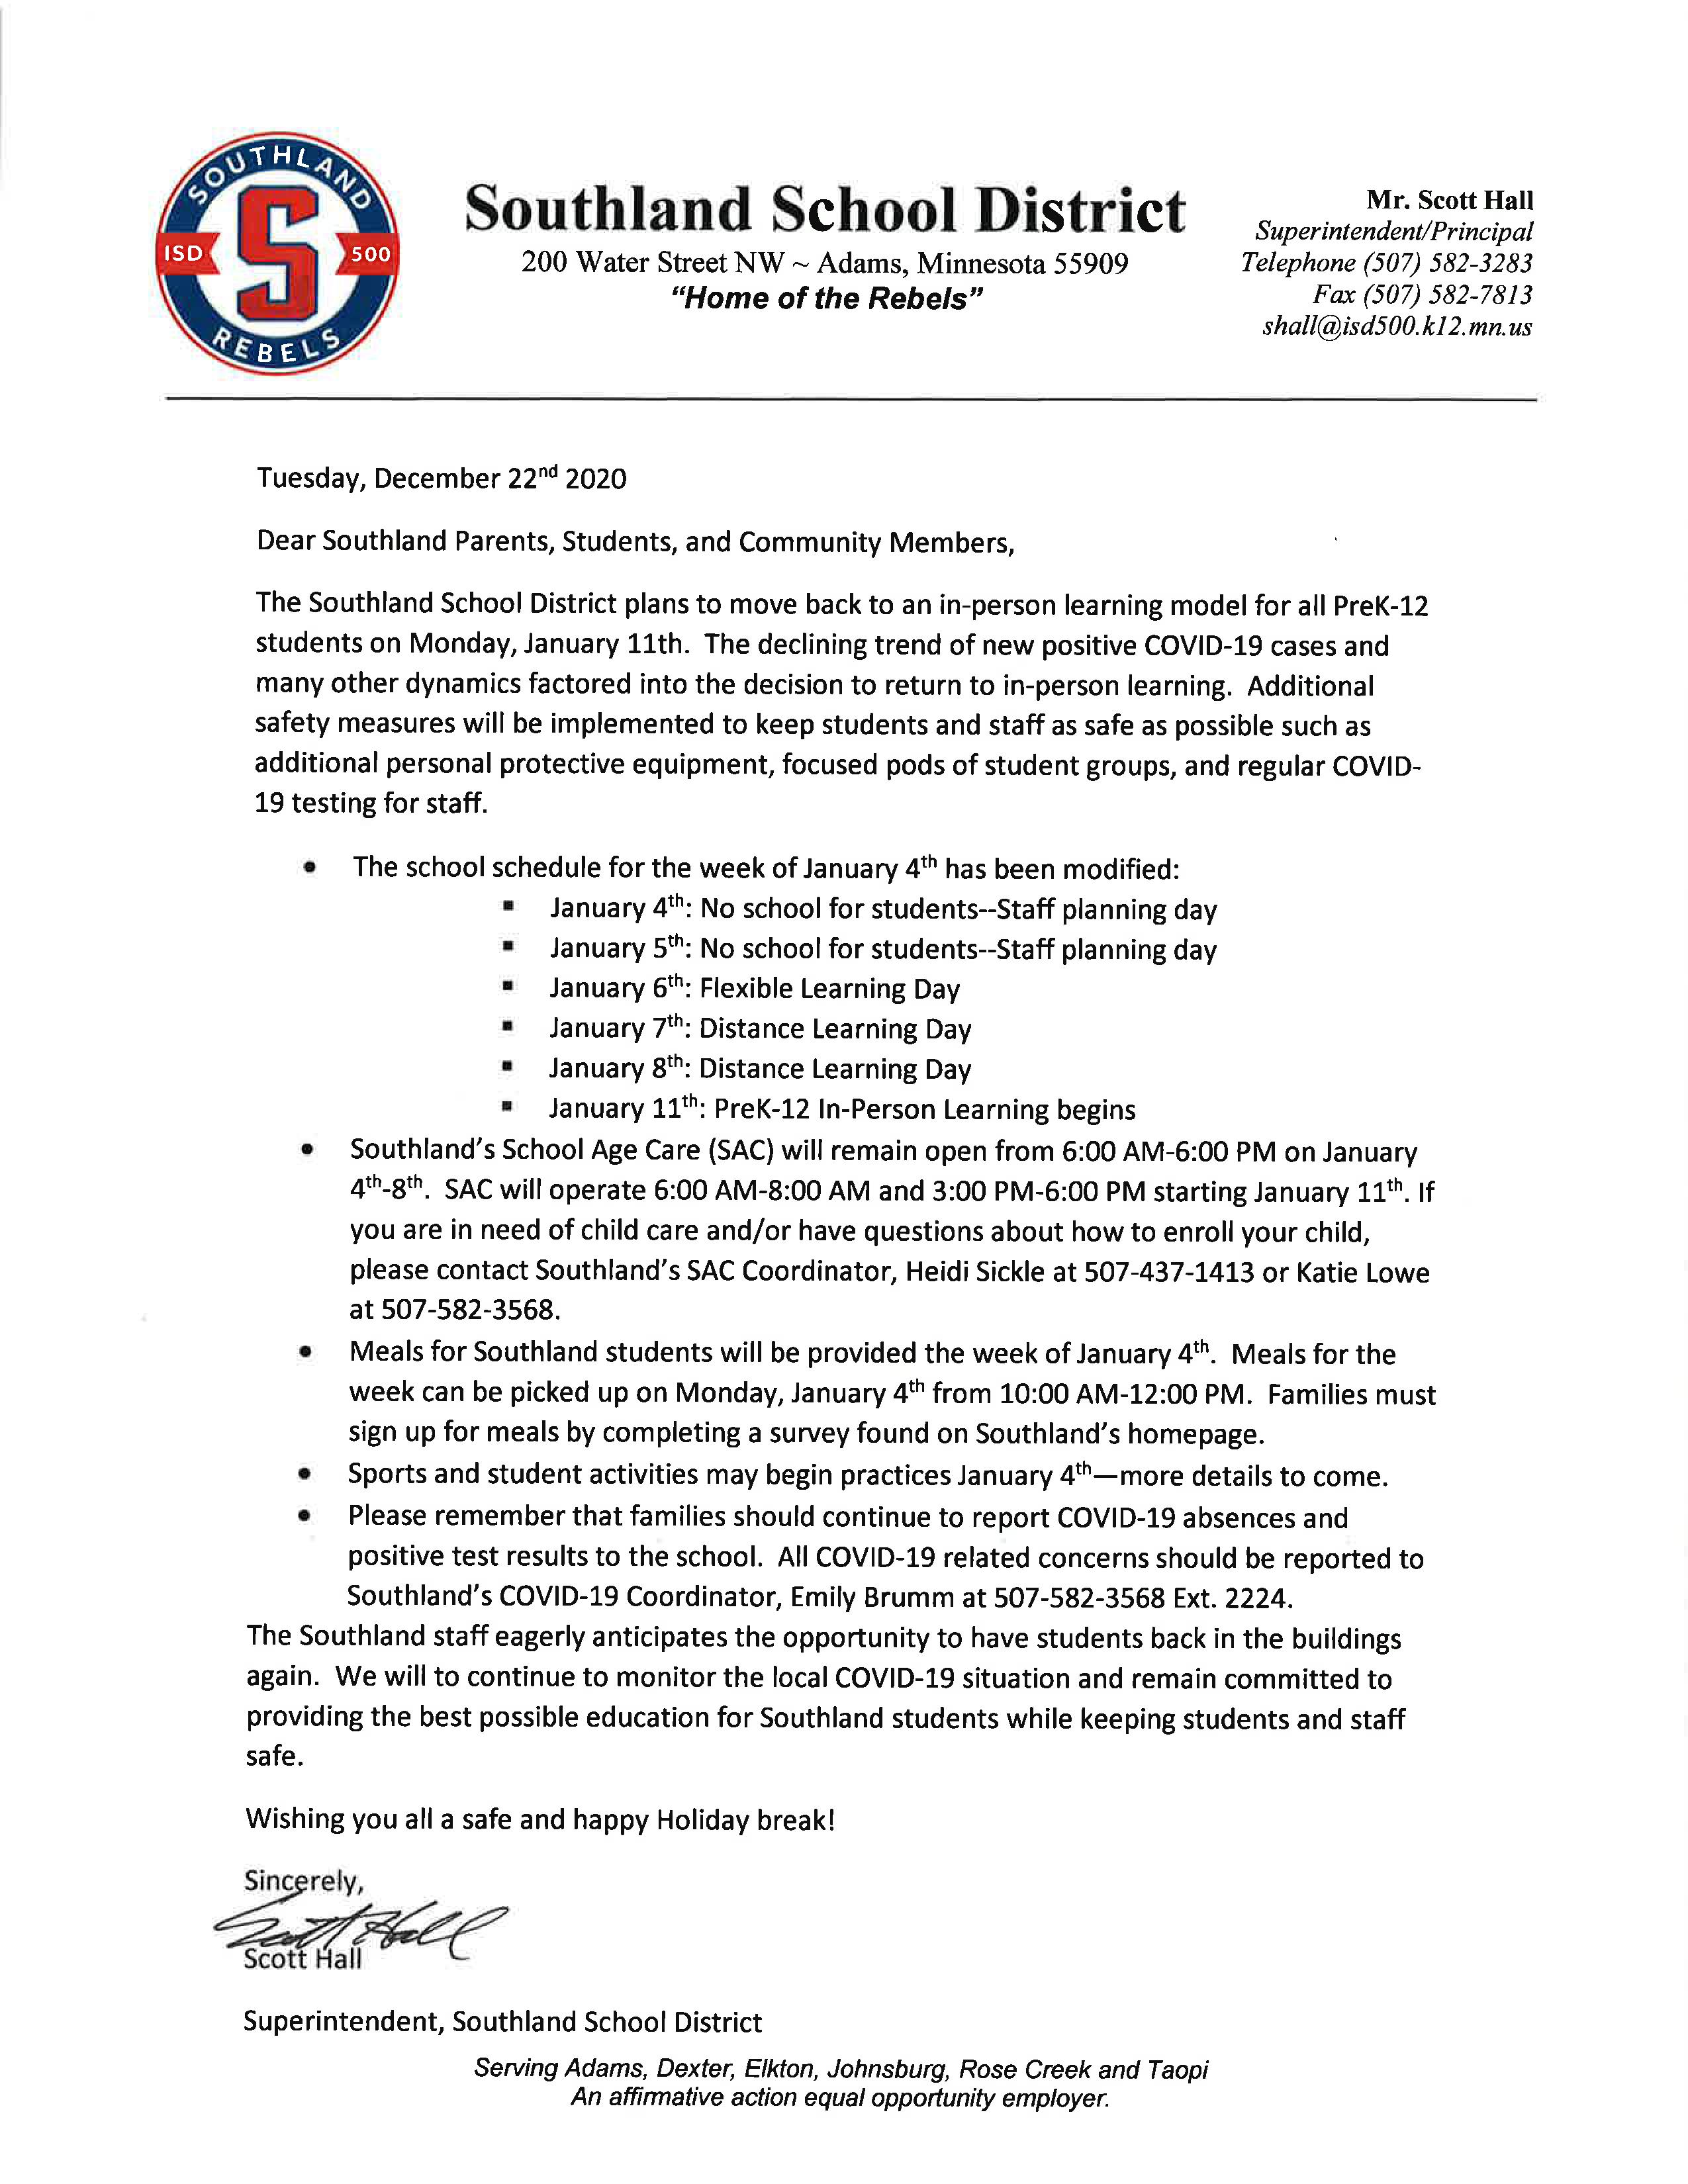 Southland Safe Learning Model Jan 11 2020